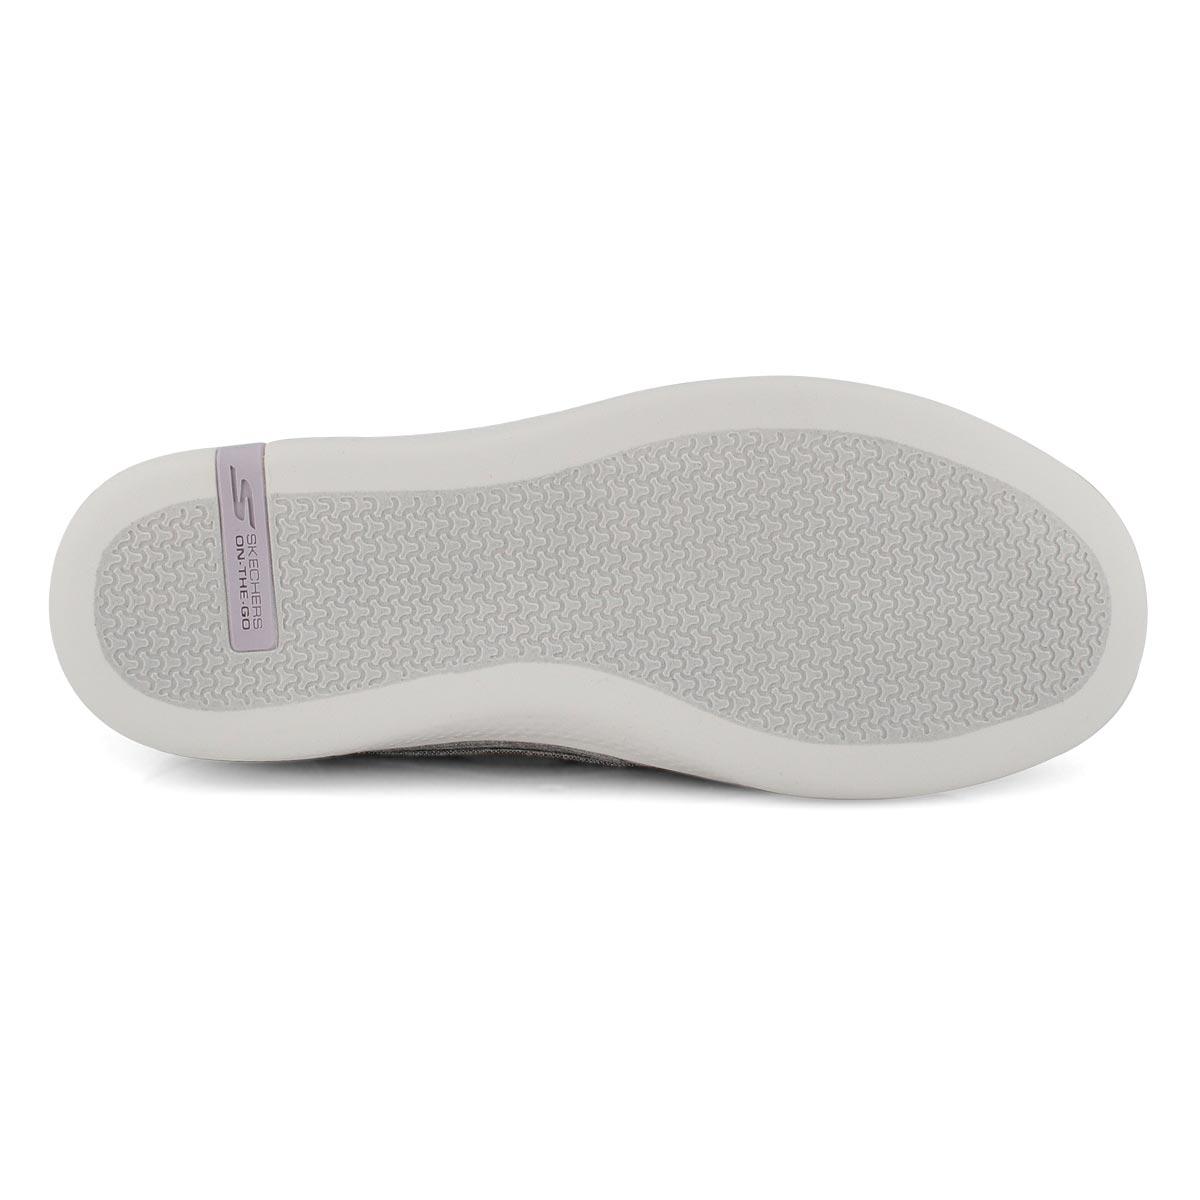 Women's Glide Ultra Waves Shoes - Grey